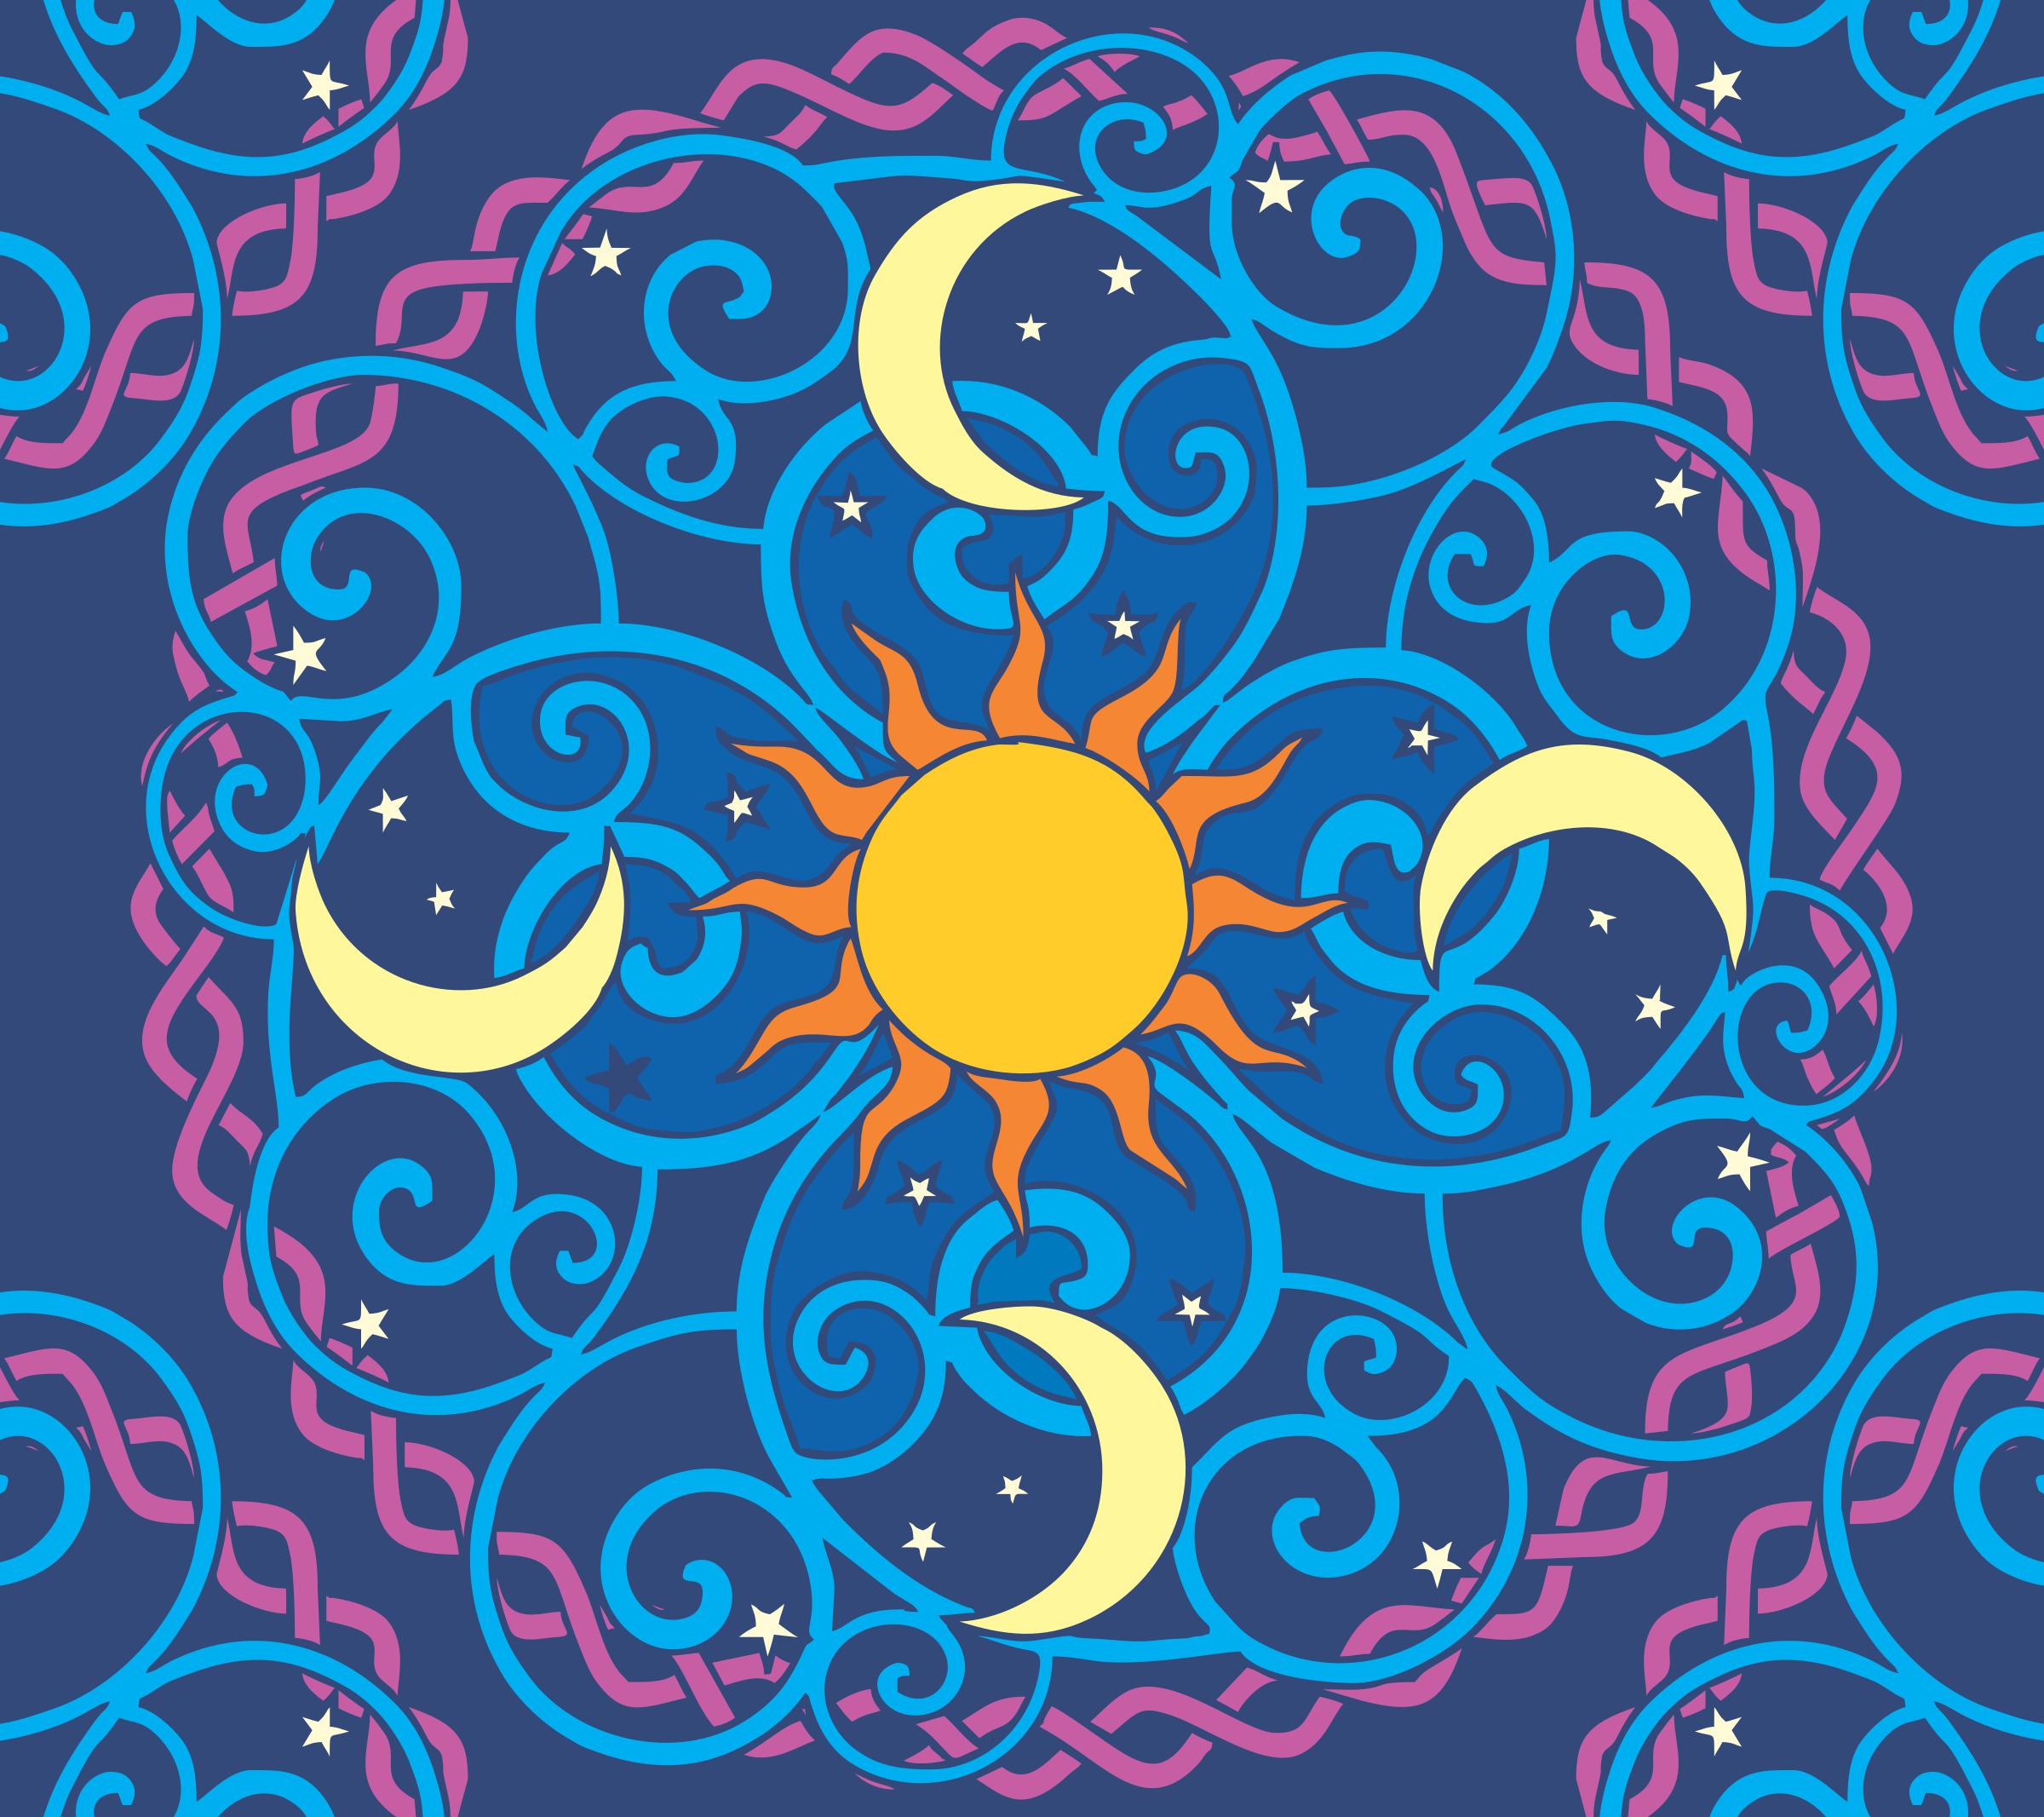 Mandala vector clipart clipart freeuse Sun Moon Mandala vector clipart image - Free stock photo - Public ... clipart freeuse